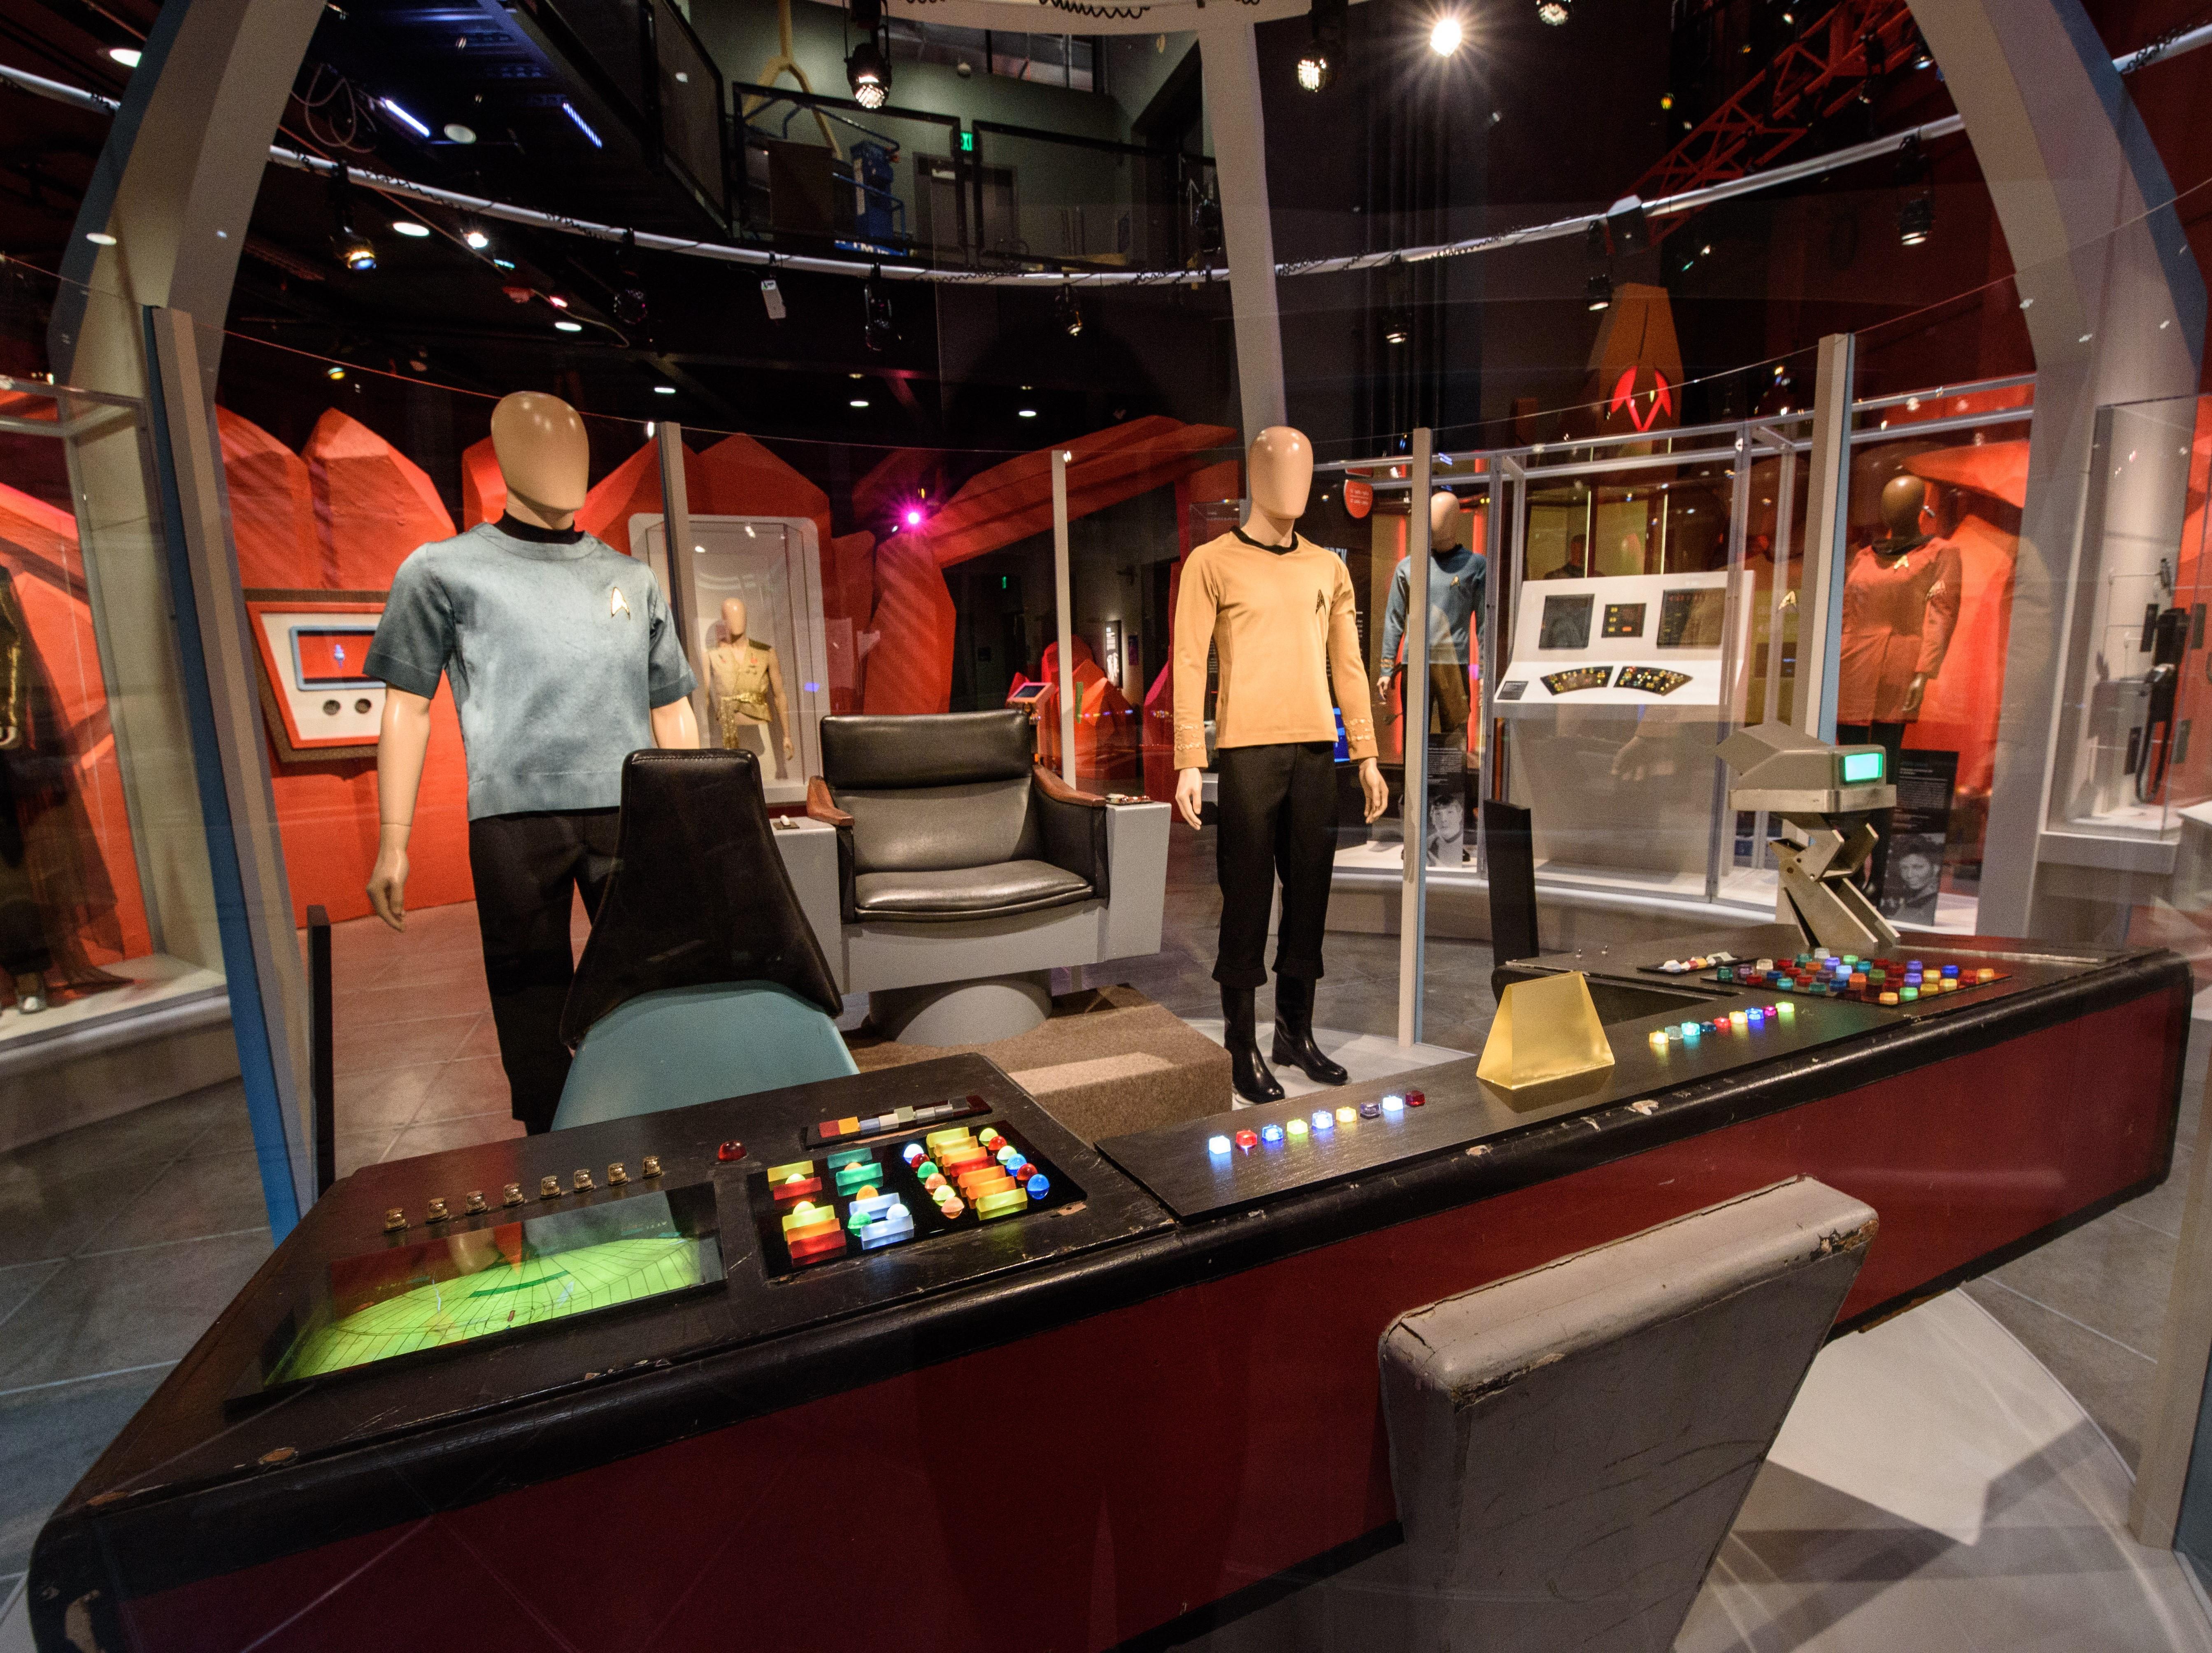 50 Years Of Star Trek Memories